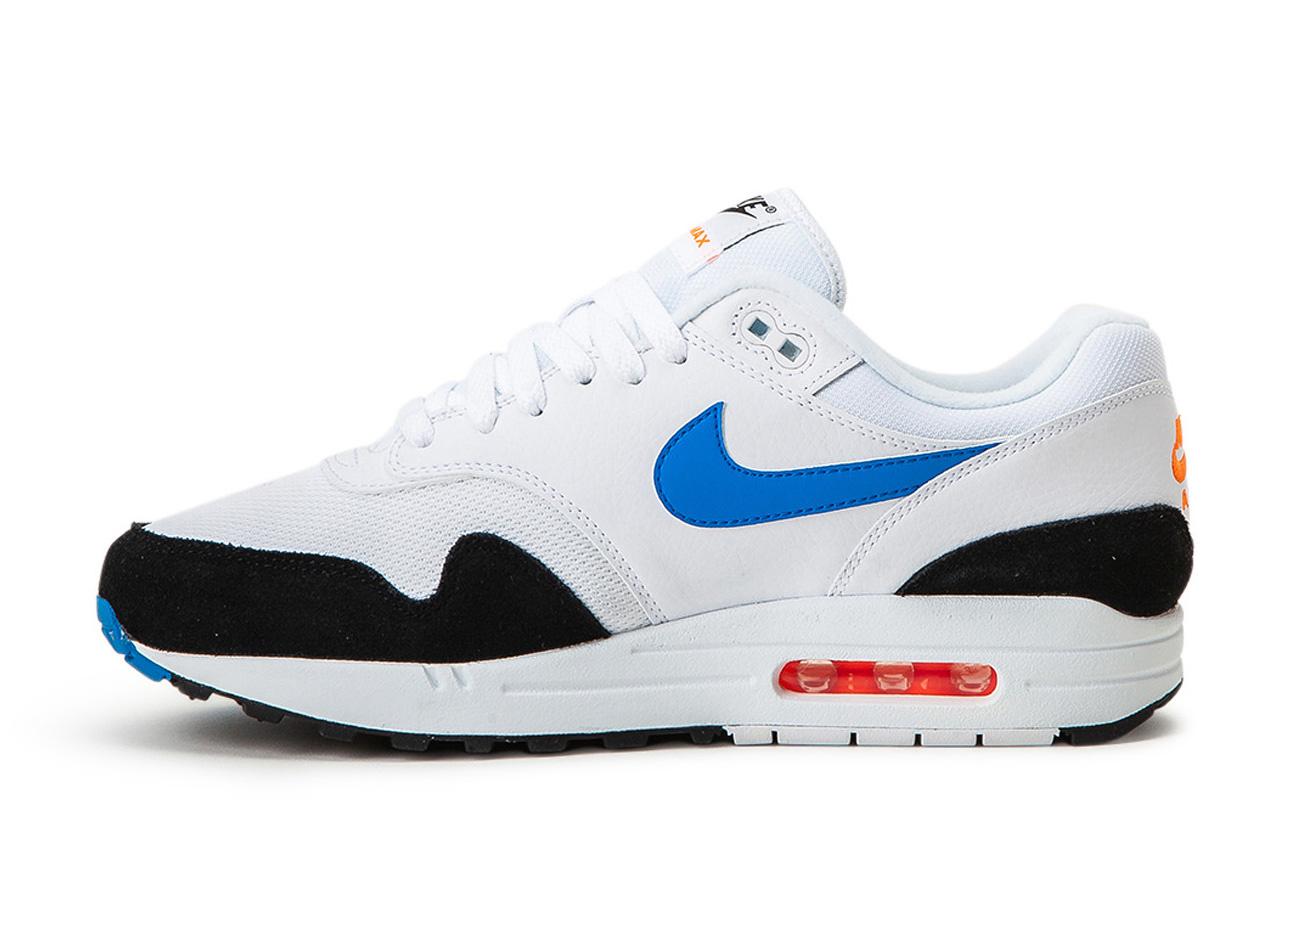 Nike Air Max 1 (WhiteBlueBlackOrangeRed) AH8145 112 Men's Sneakers